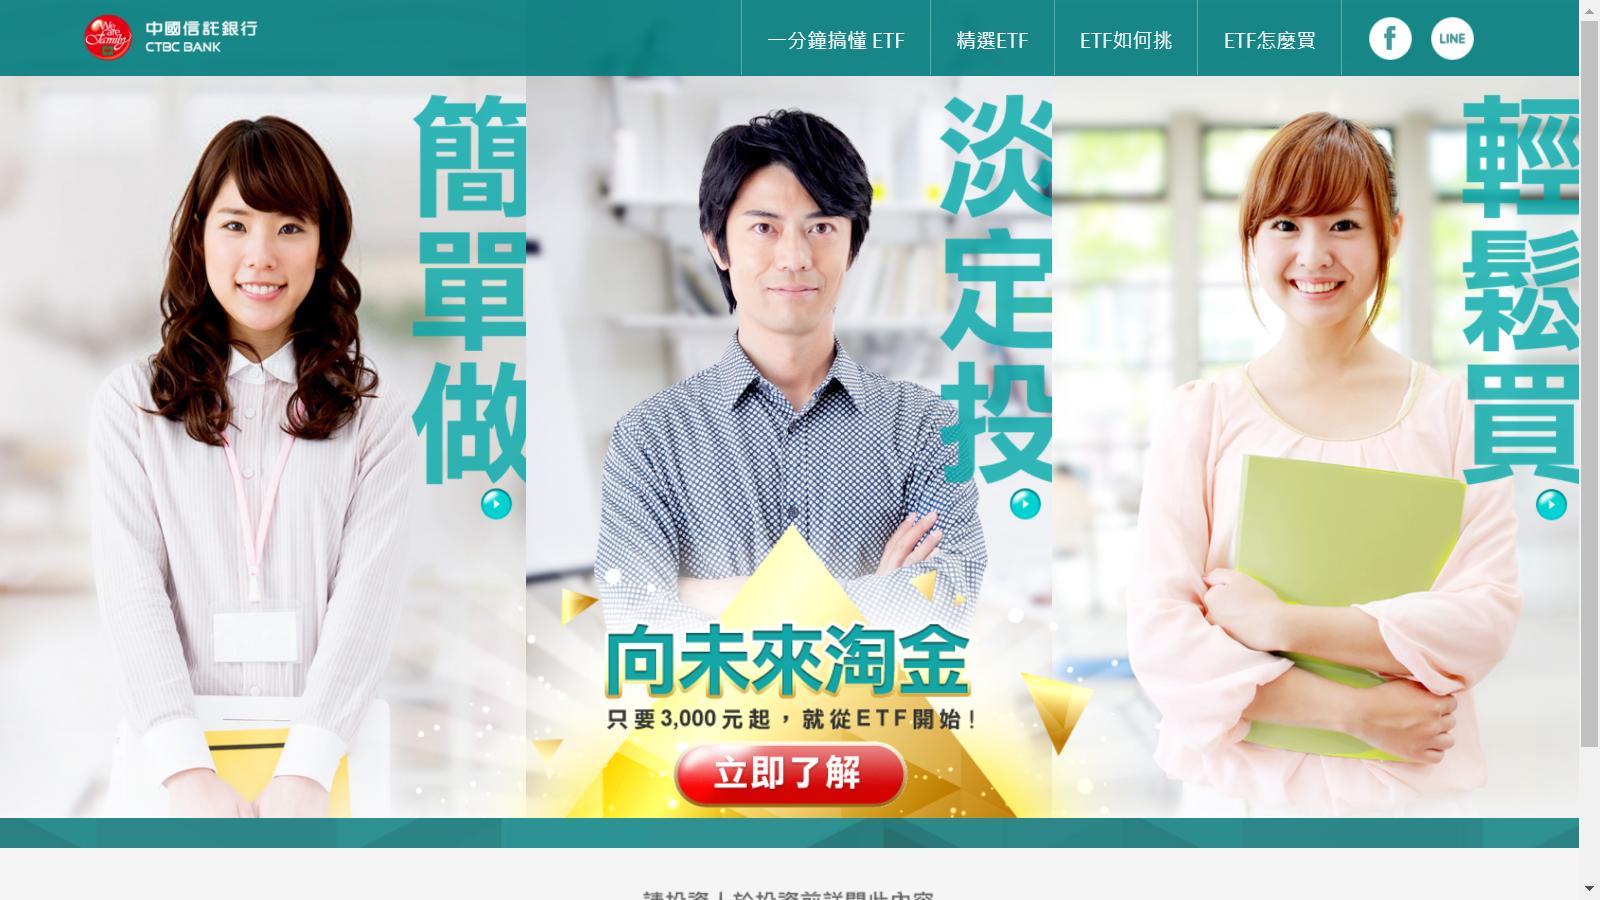 [ETF基金]使用中國信託購買國外ETF真方便 - Tse-Yao的部落格